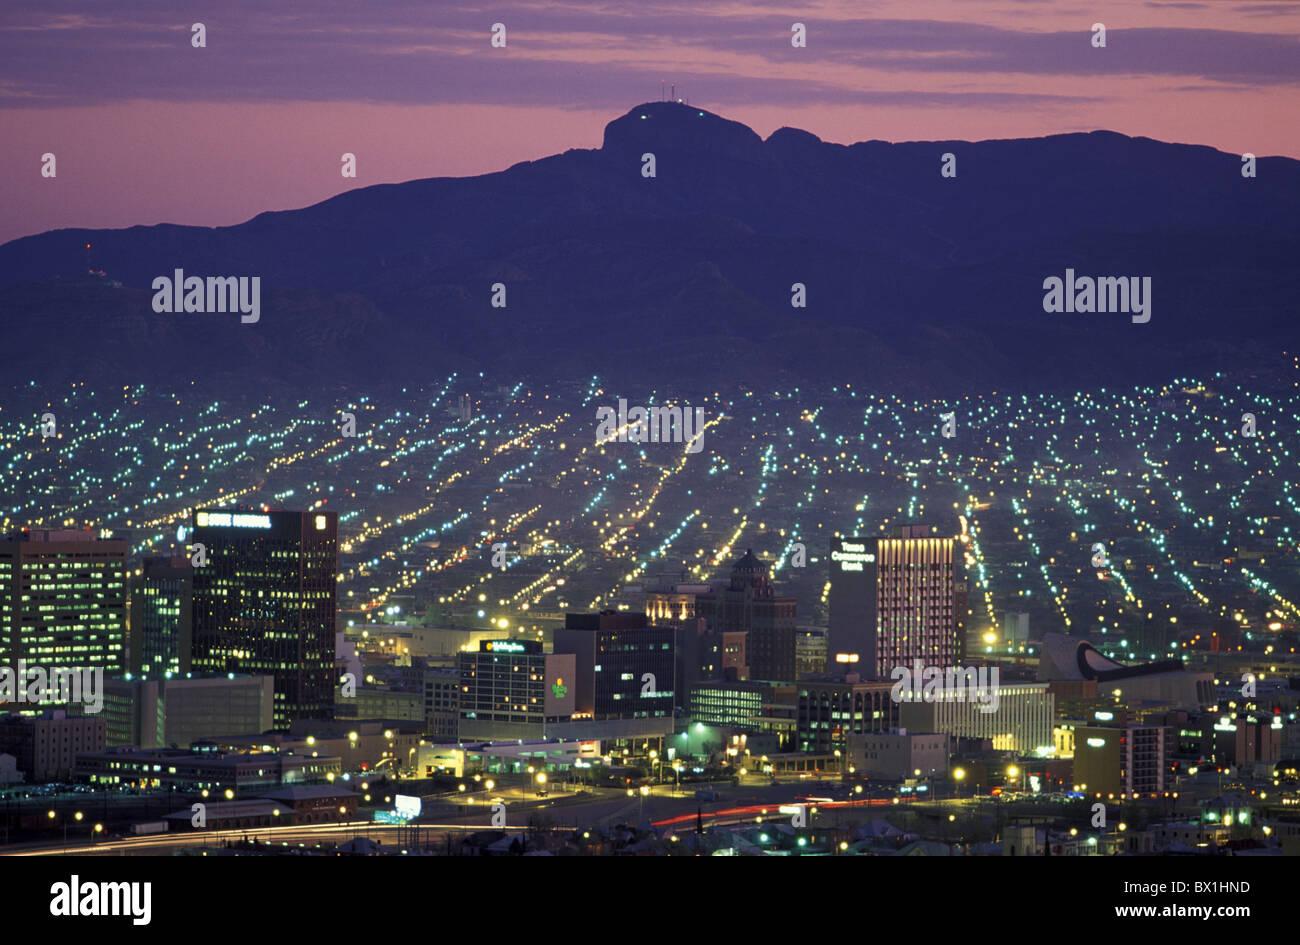 El paso texas usa america united states city lights night for El paso america